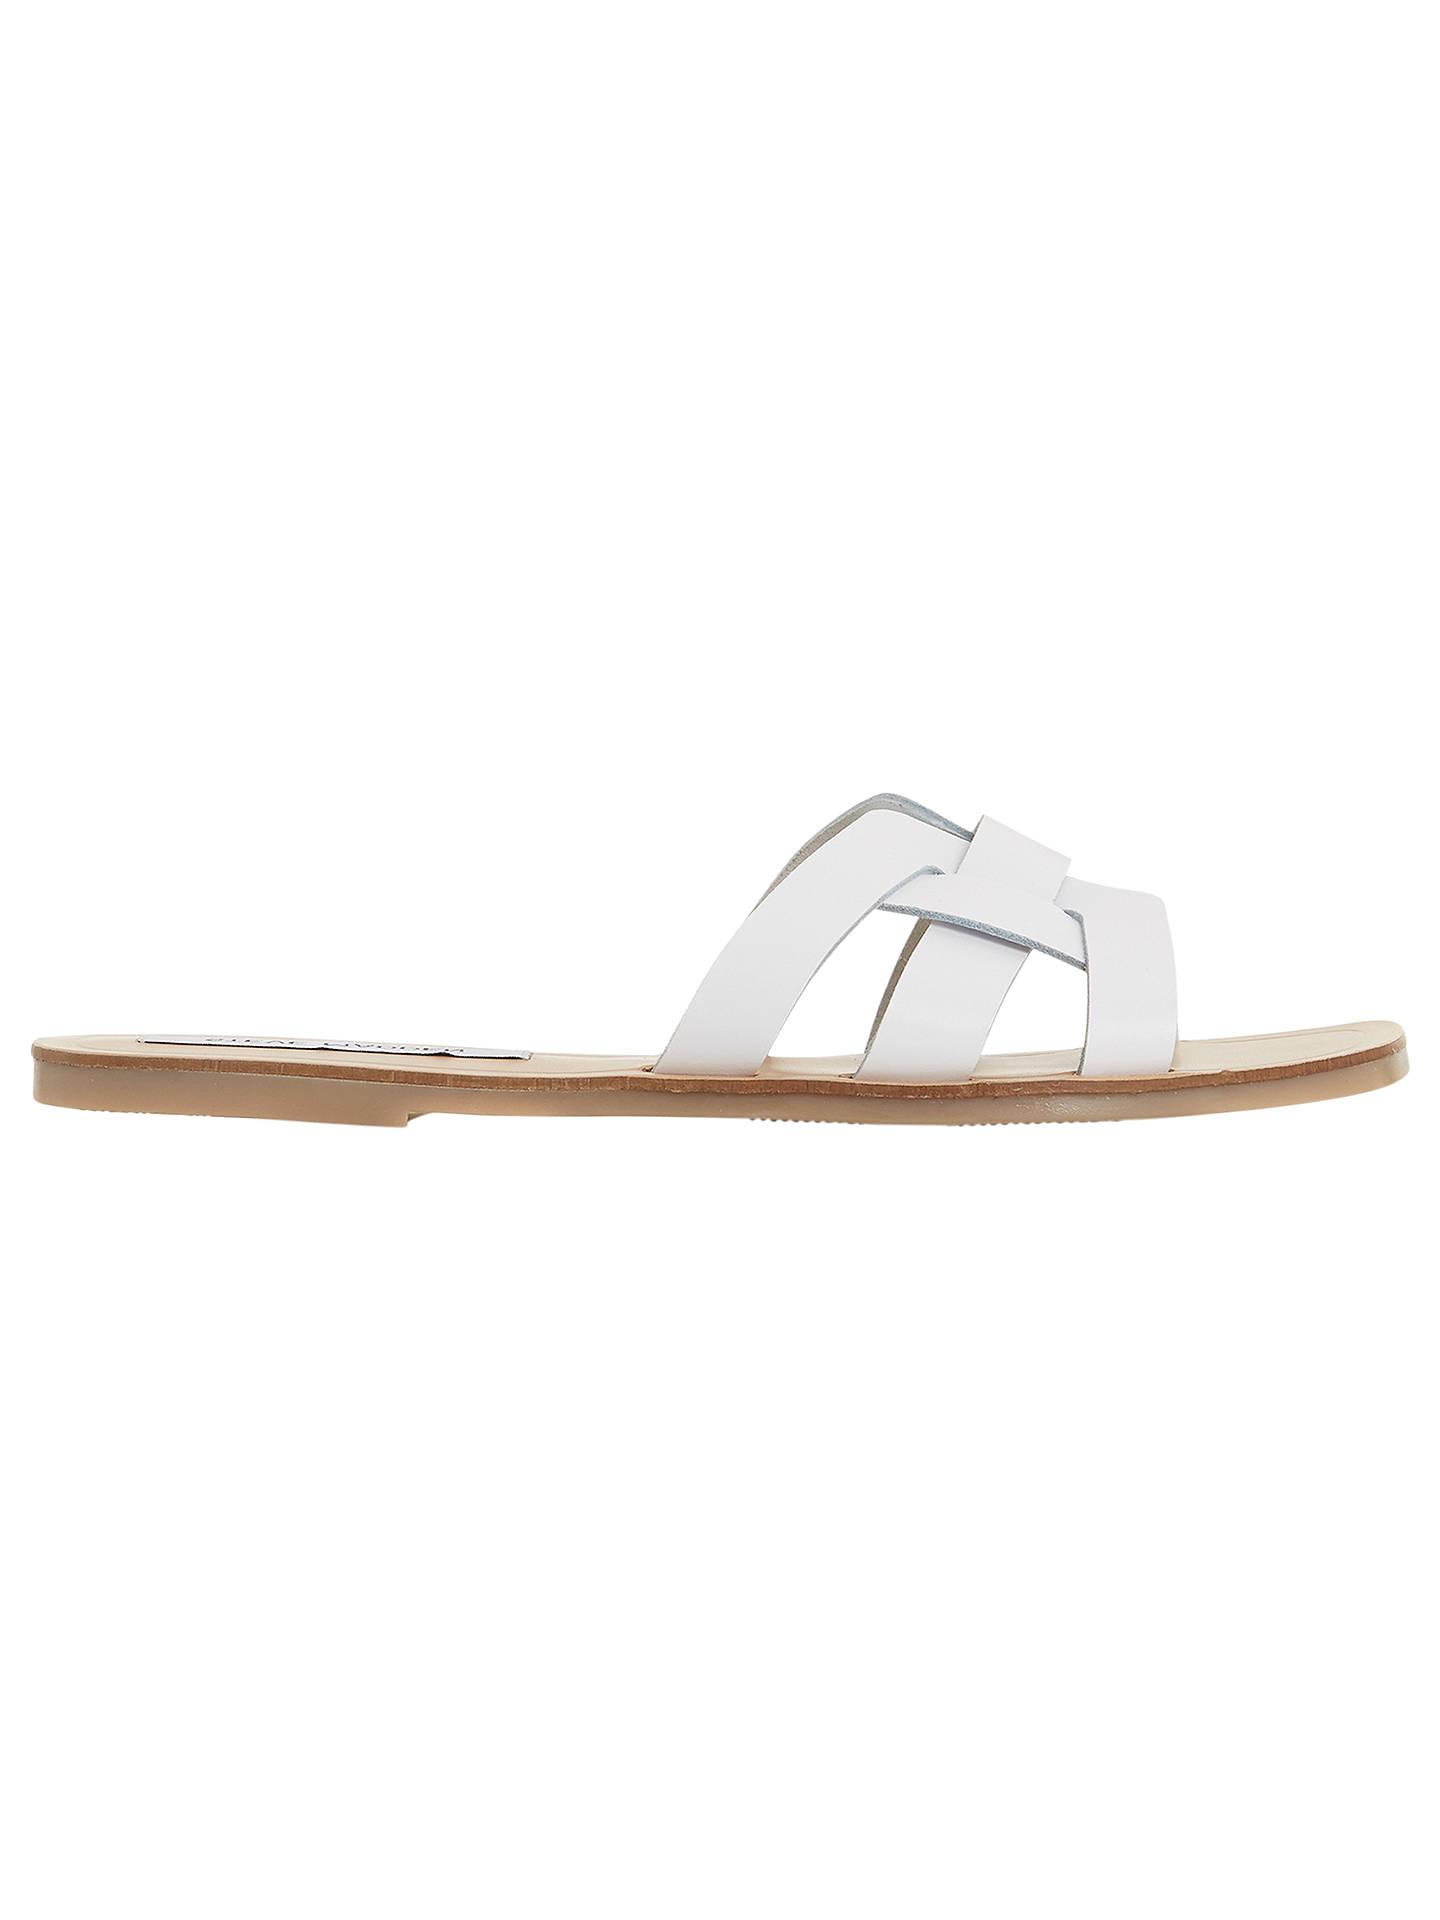 8308970acb7 Steve Madden Sicily Sandals, White Leather at John Lewis & Partners